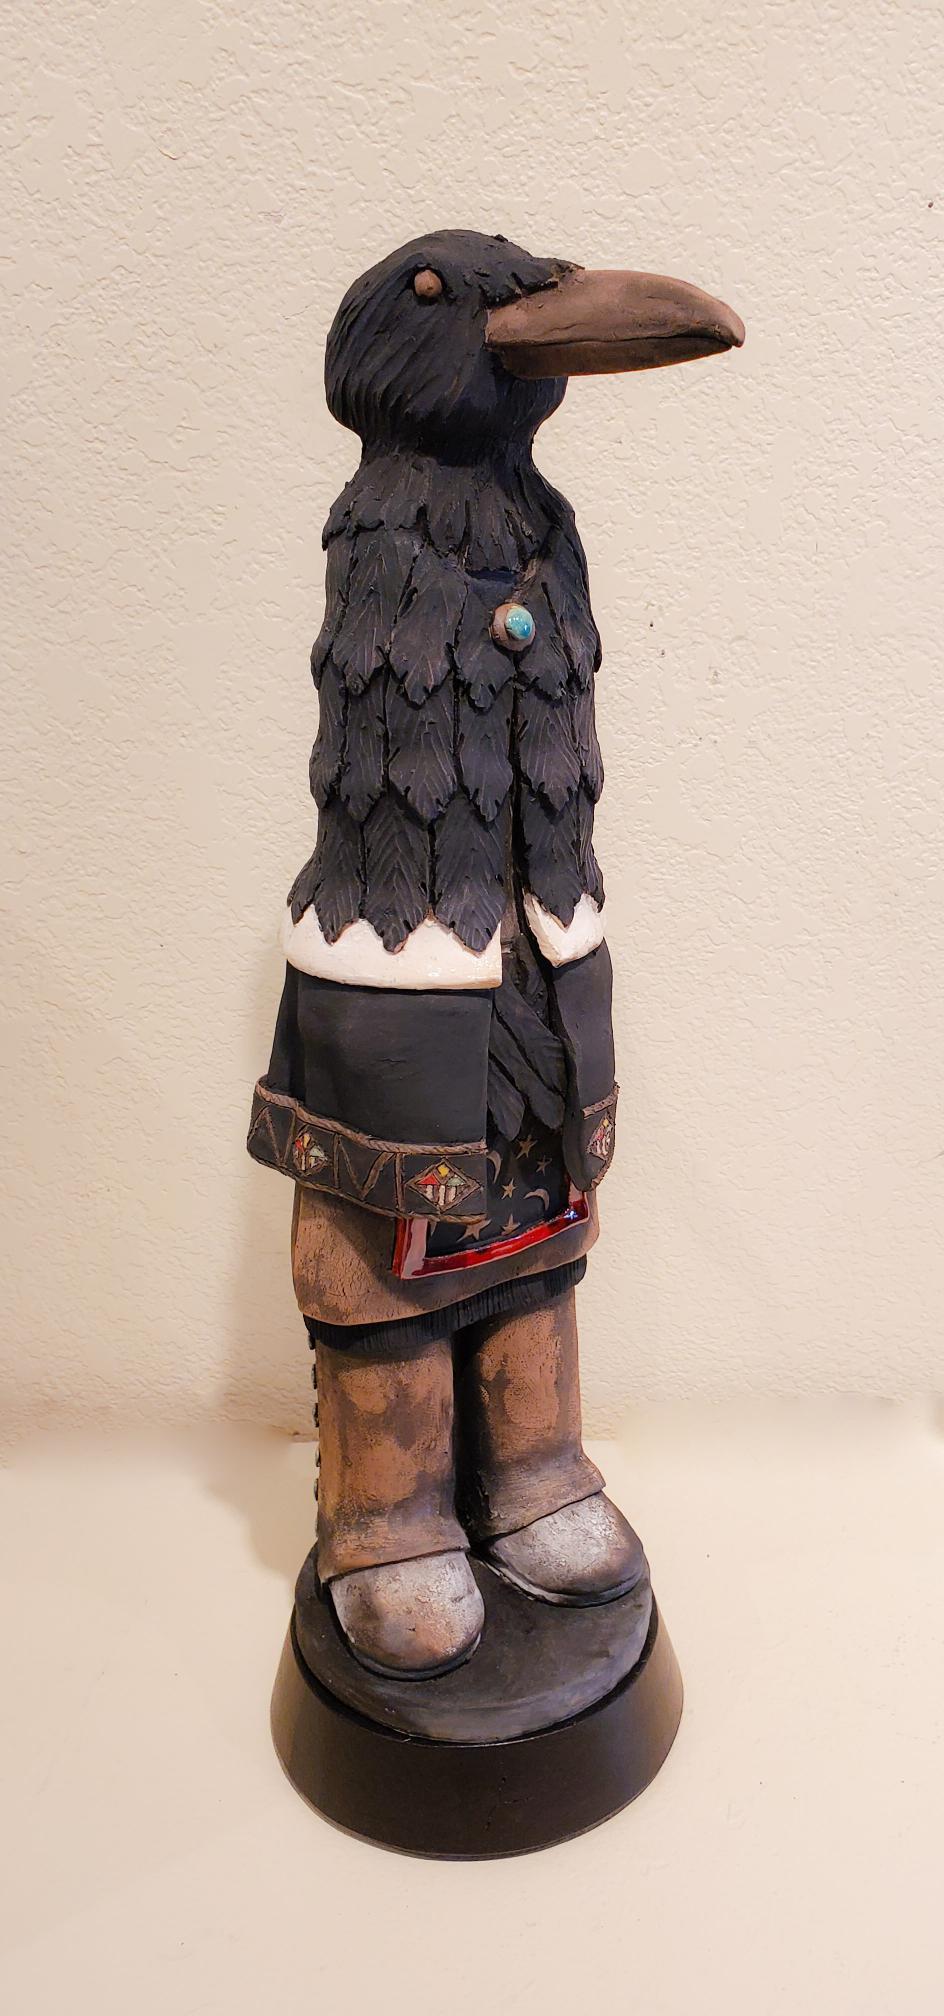 Raven #4, John Booth, Ceramic Sculpture, Rogoway Gallery